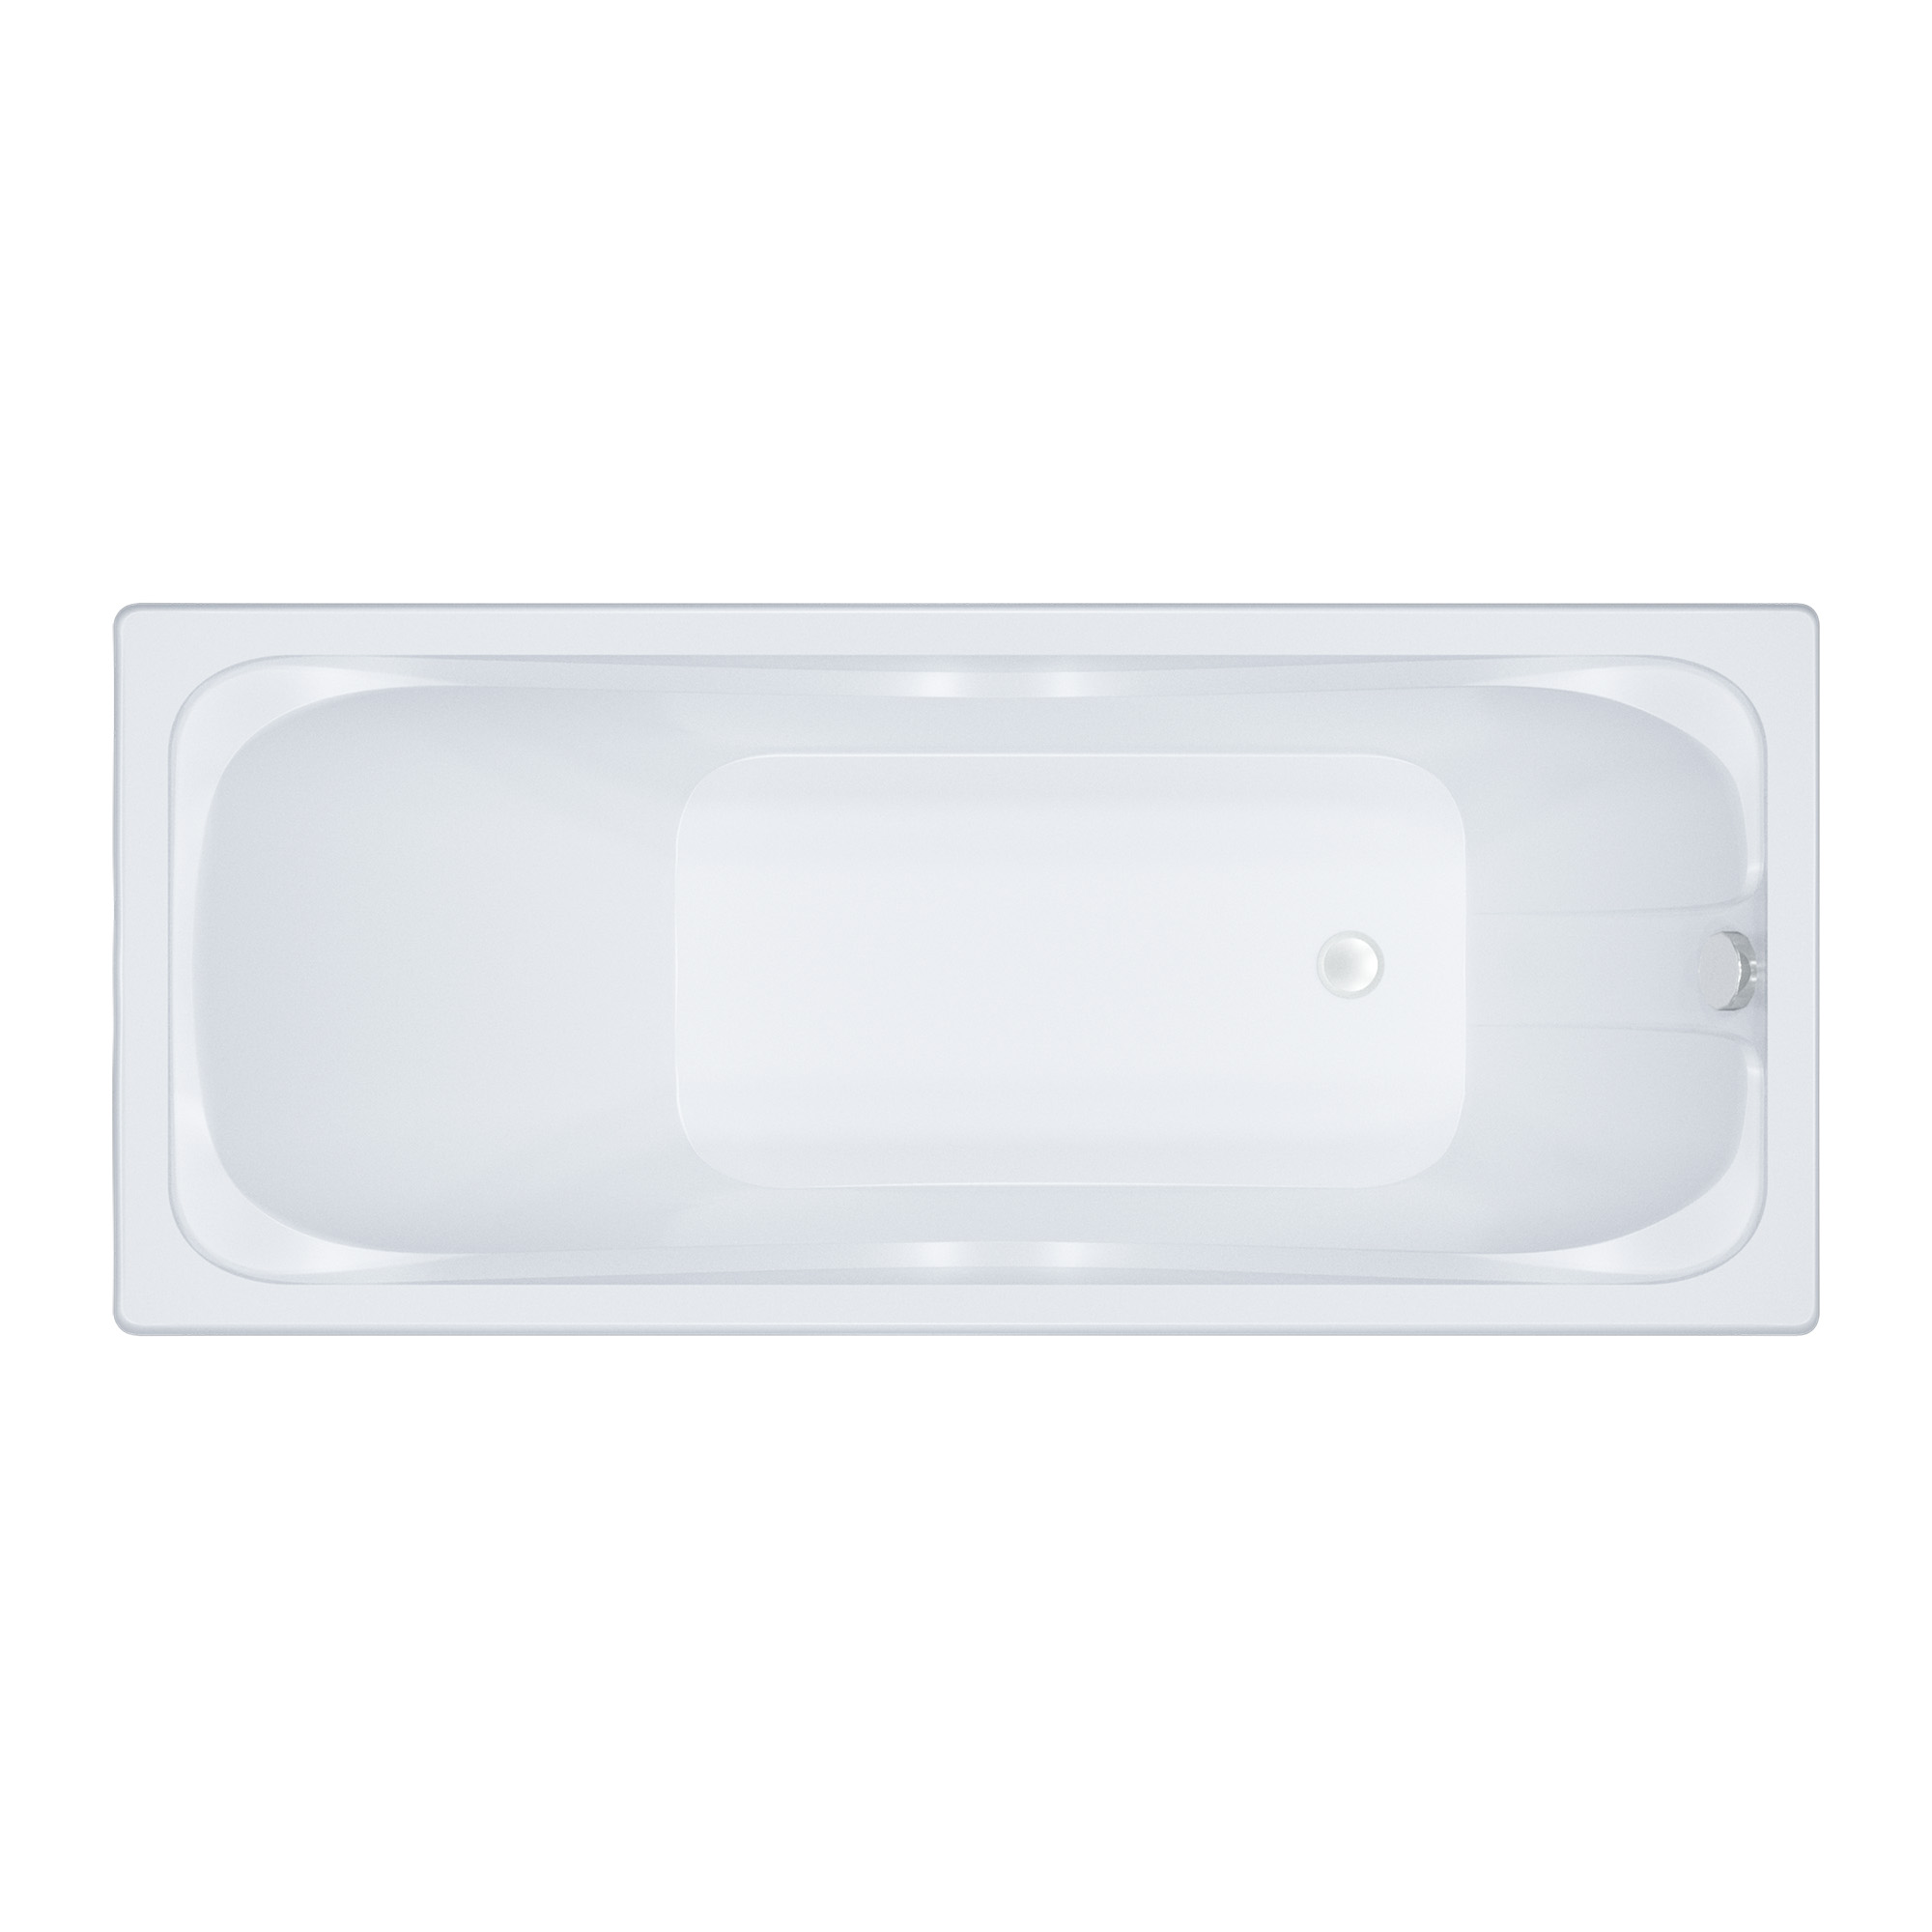 Акриловая ванна Тритон Стандарт 120 экран для ванны triton стандарт 120